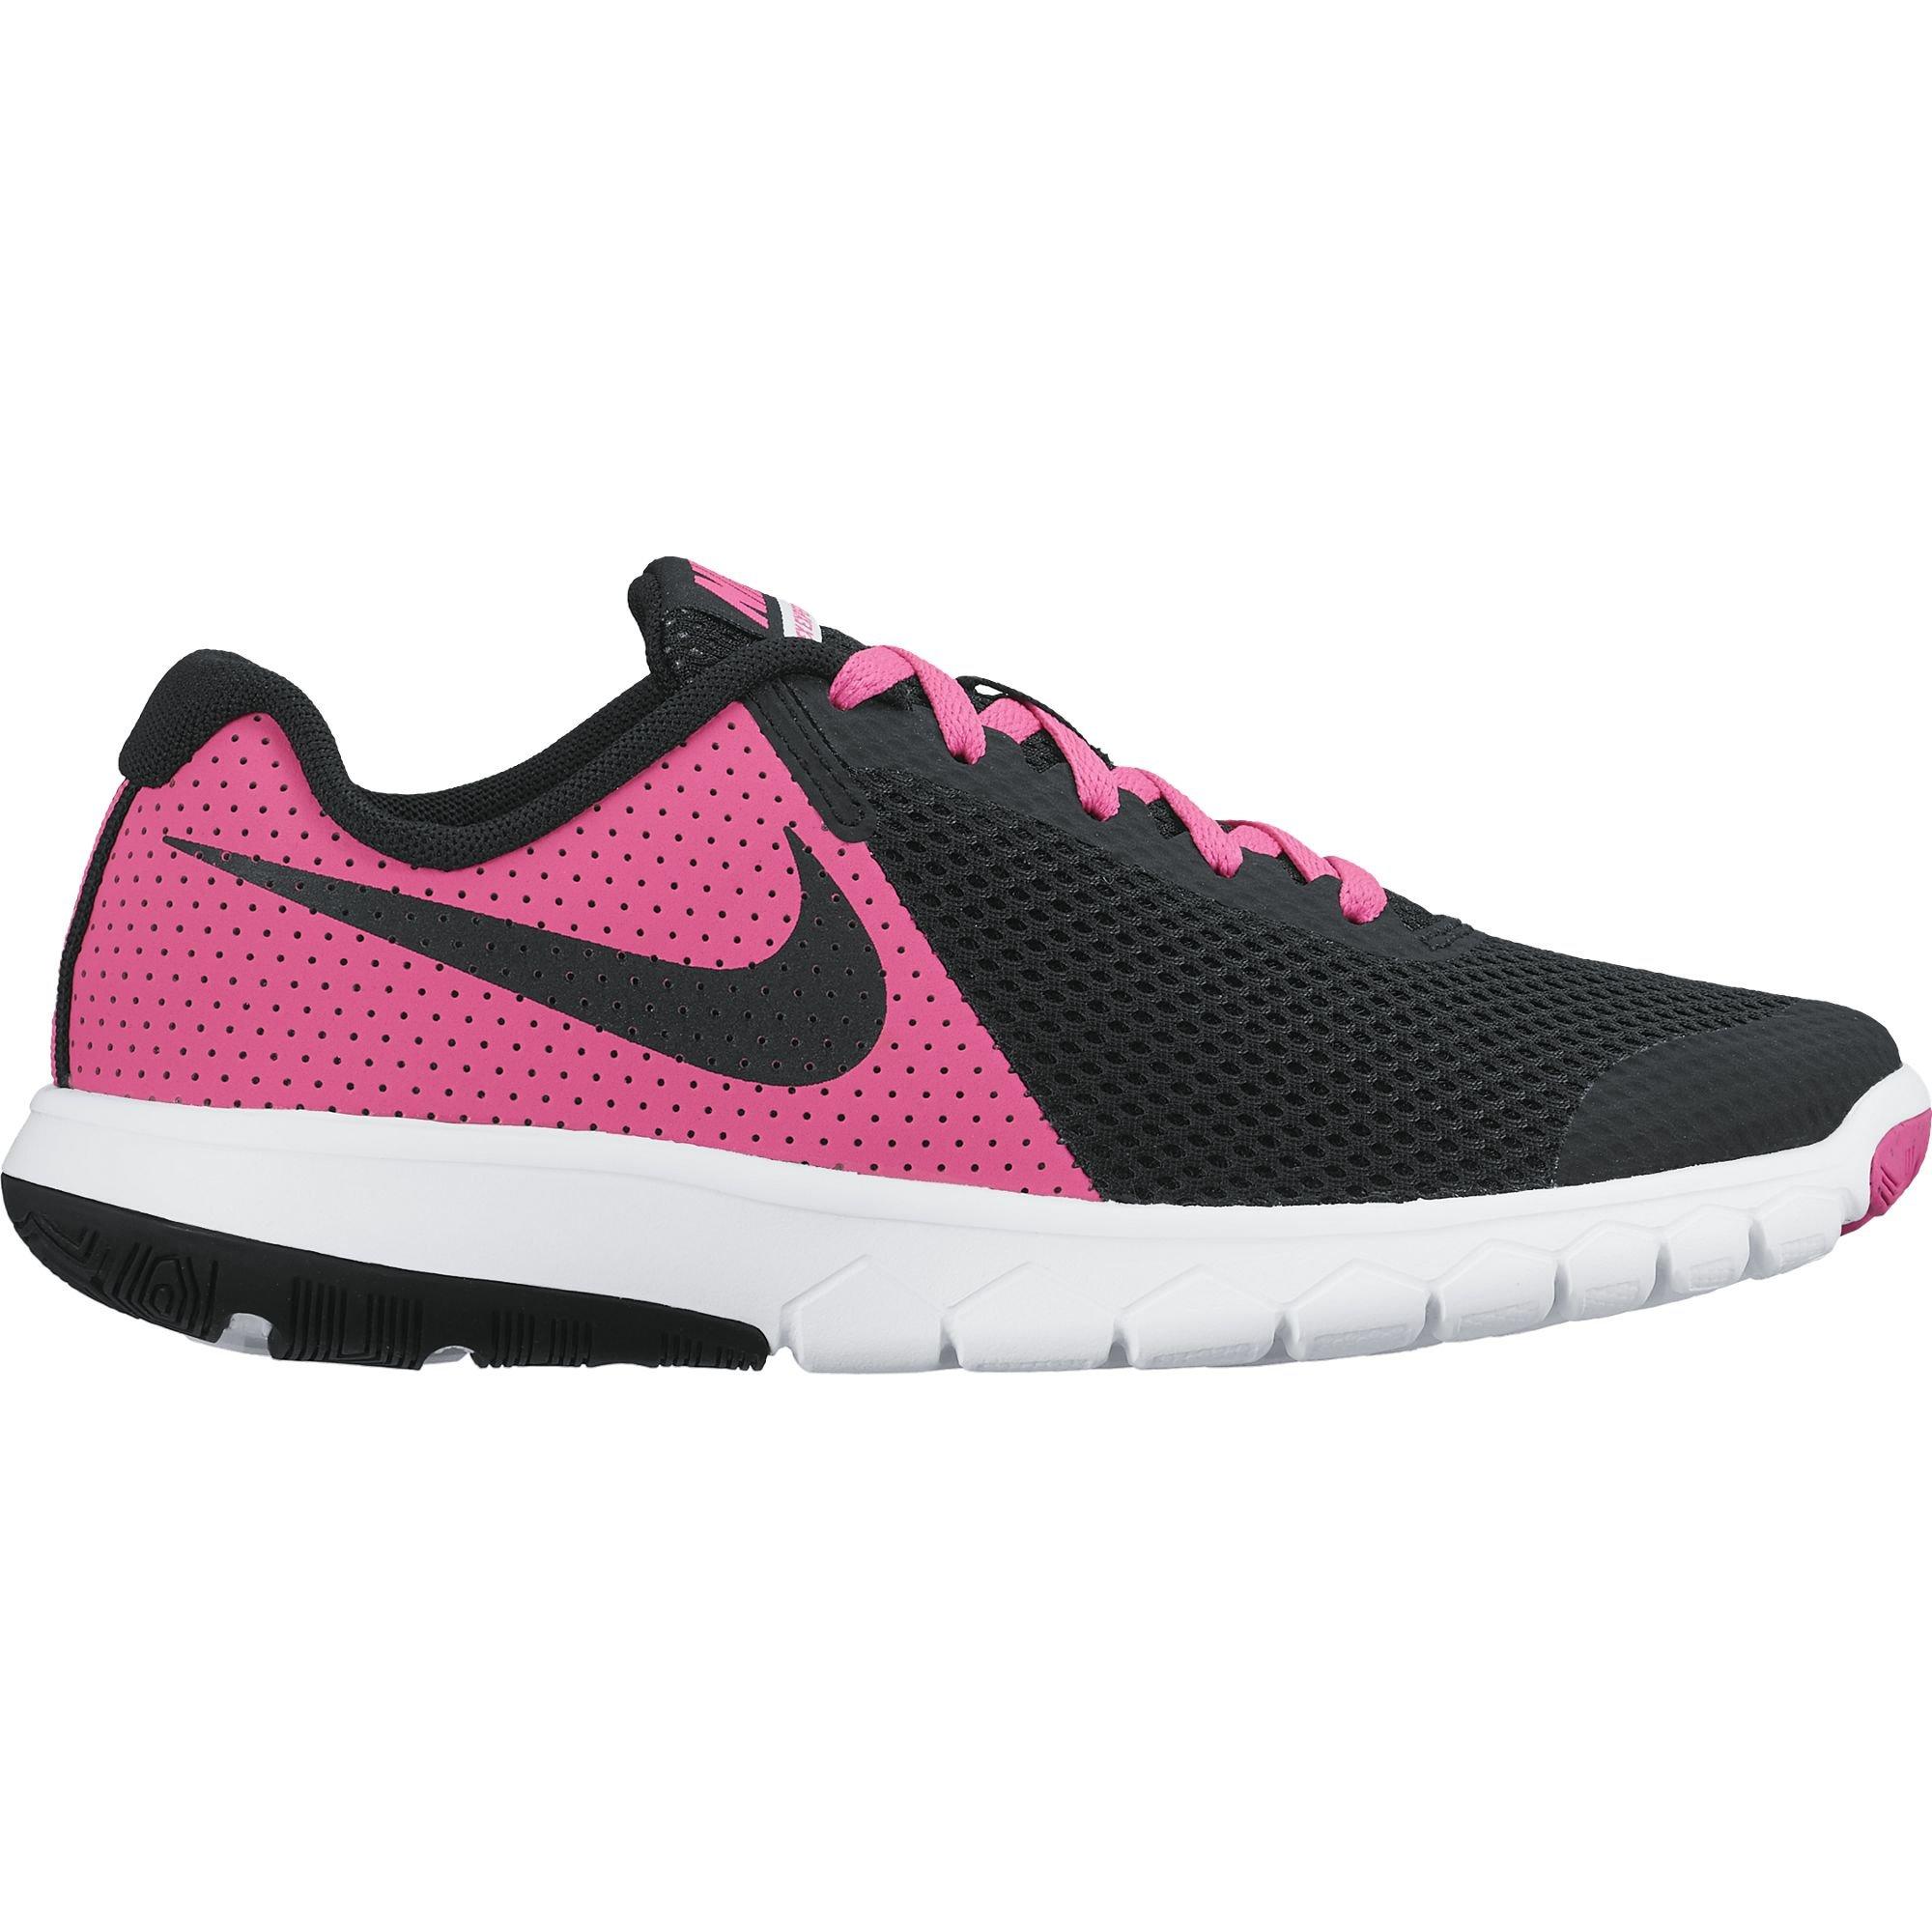 cheaper 3025e 71606 Galleon - Nike Girl s Flex Experience 5 (GS) Wide Running Shoe 6.5 Big Kid M,  Pink Blast Black White